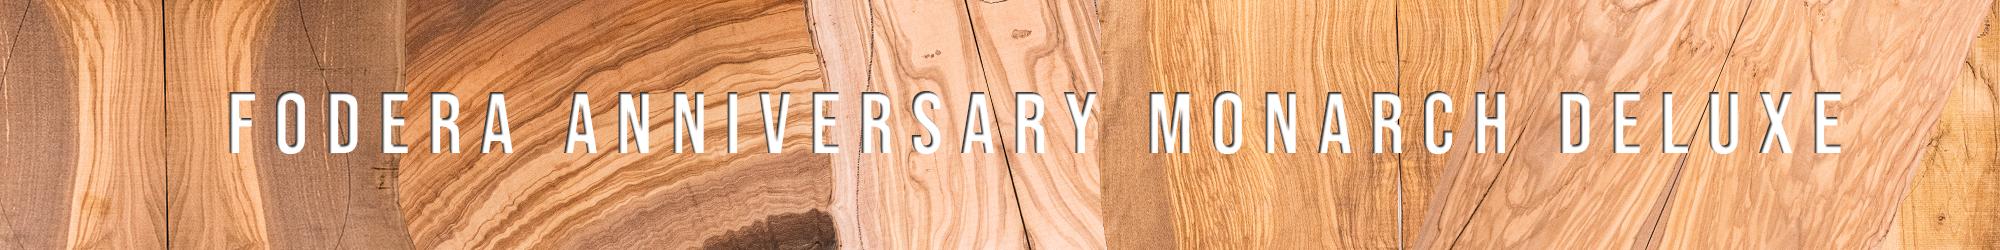 Fodera Anniversary Monarch Deluxe Bass Banner